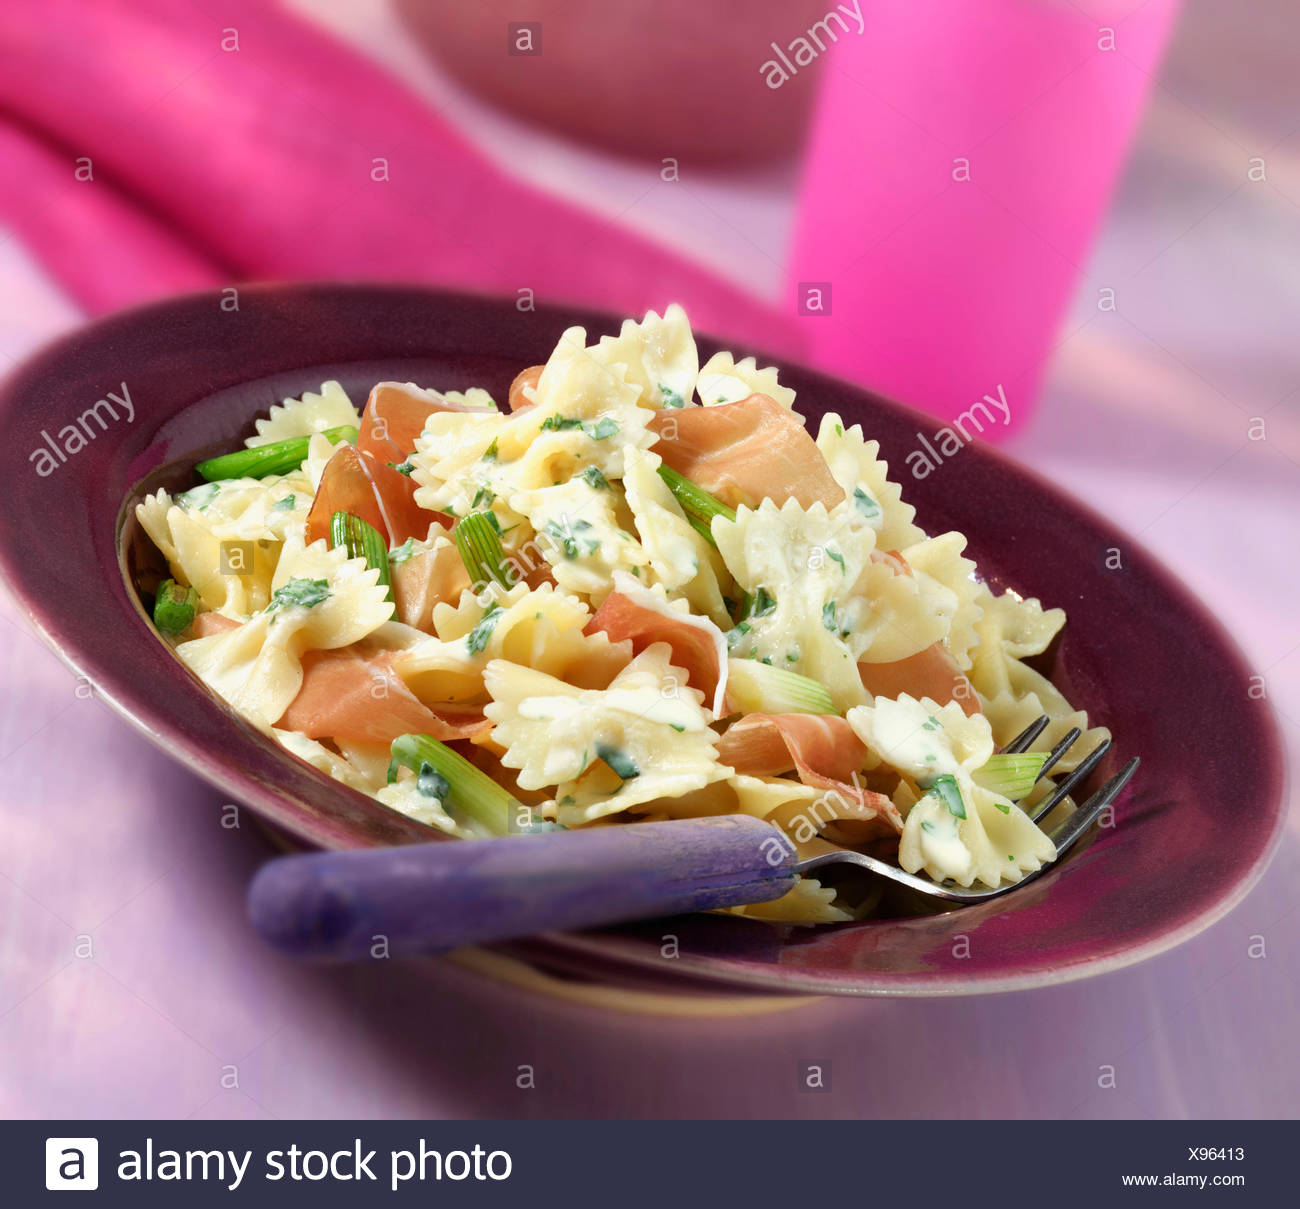 Plato de Farfalle caseras con jamón y cebolla Imagen De Stock